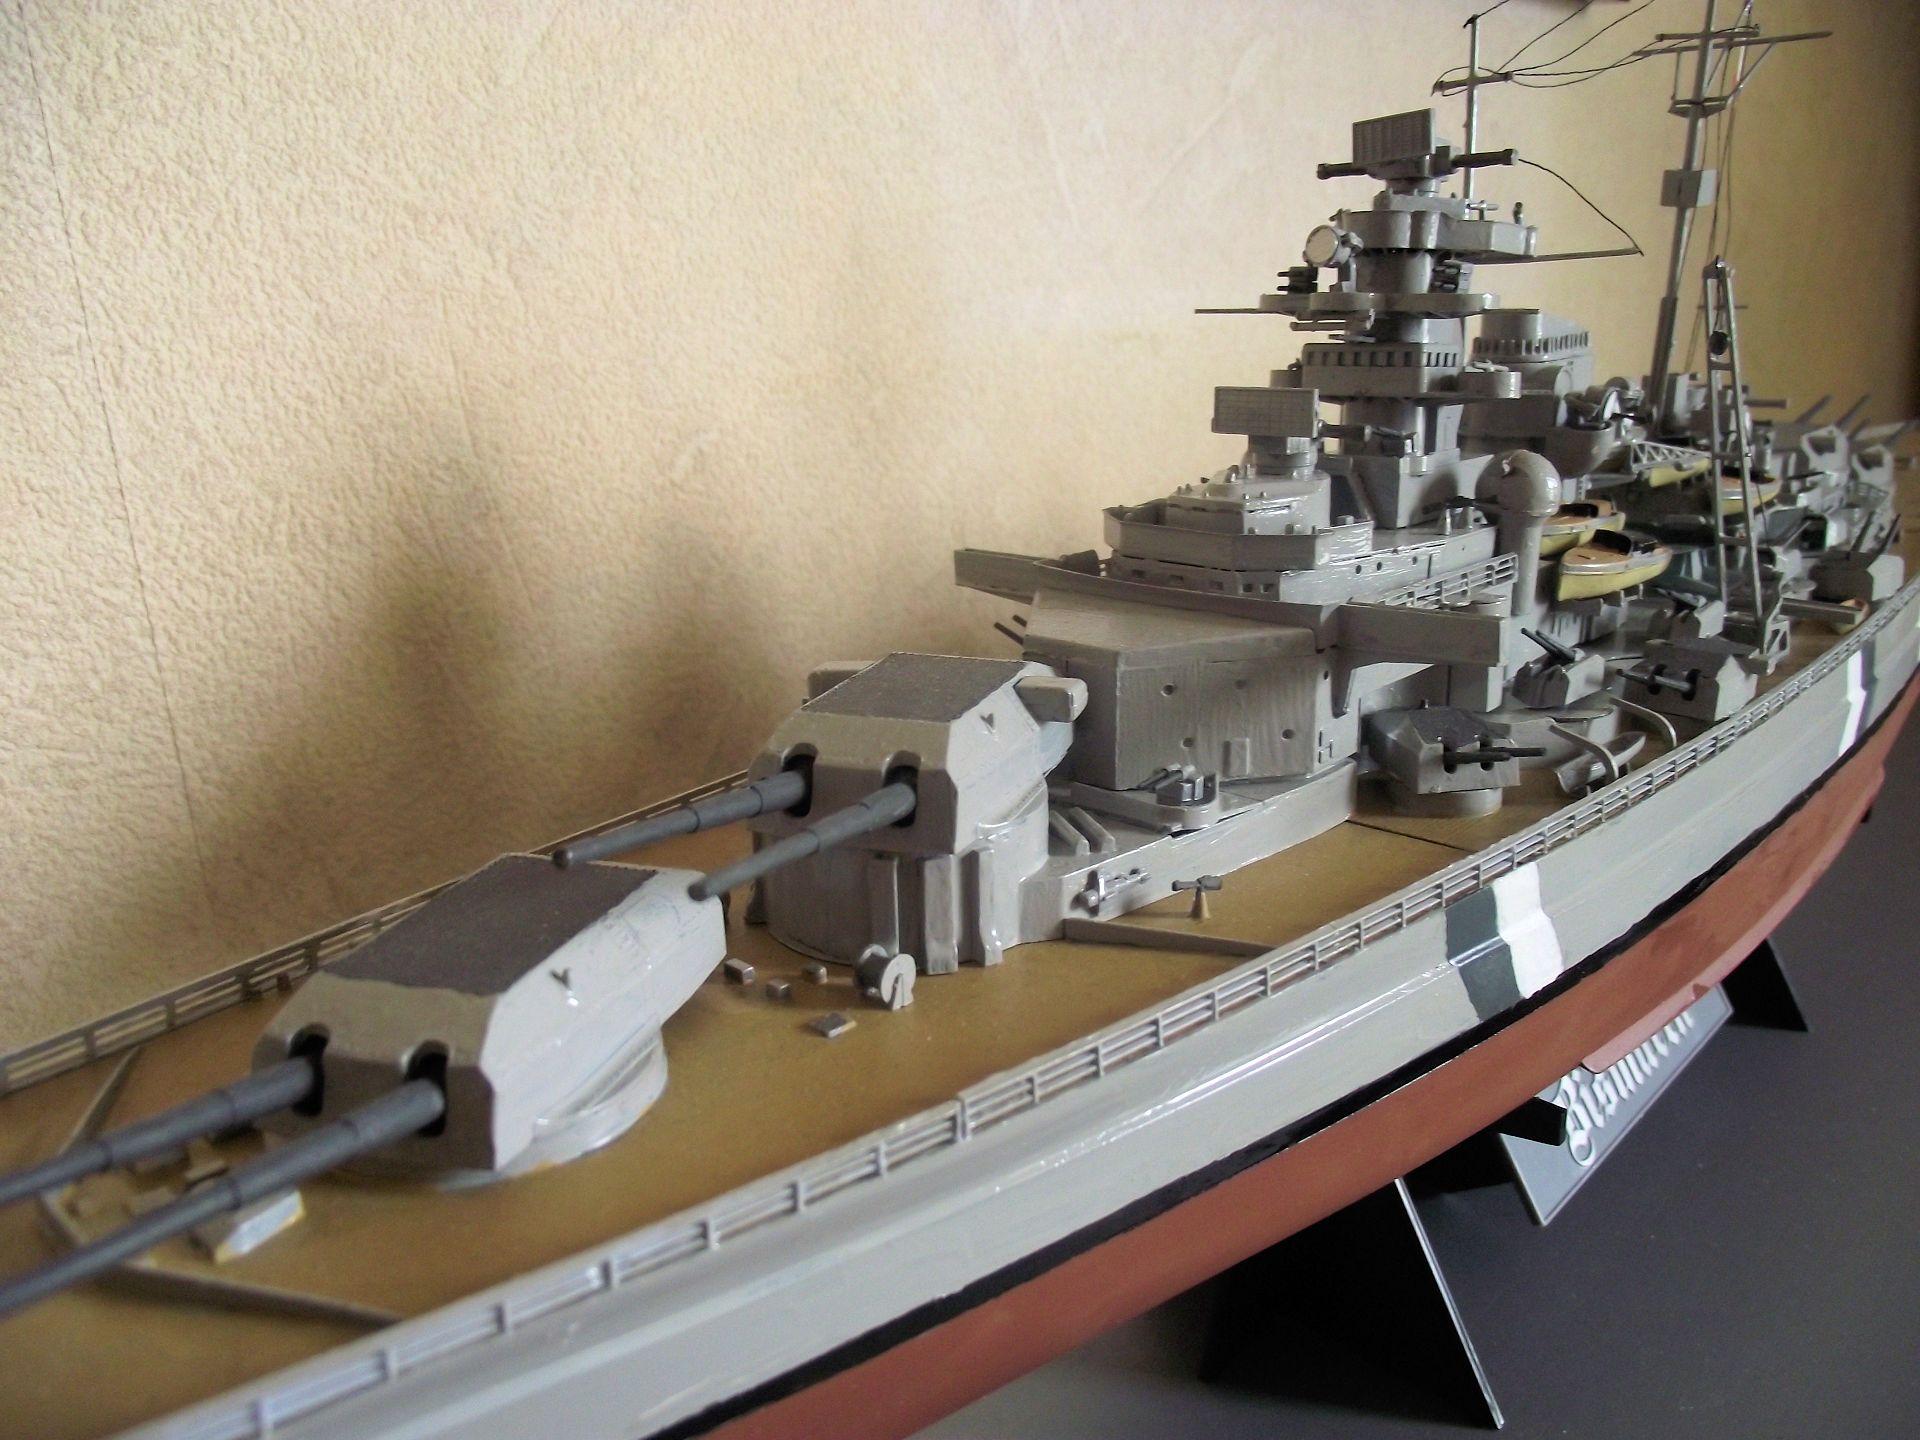 Bismarck au 1/350 Tamiya  137640MaquetteBismarck1x3504